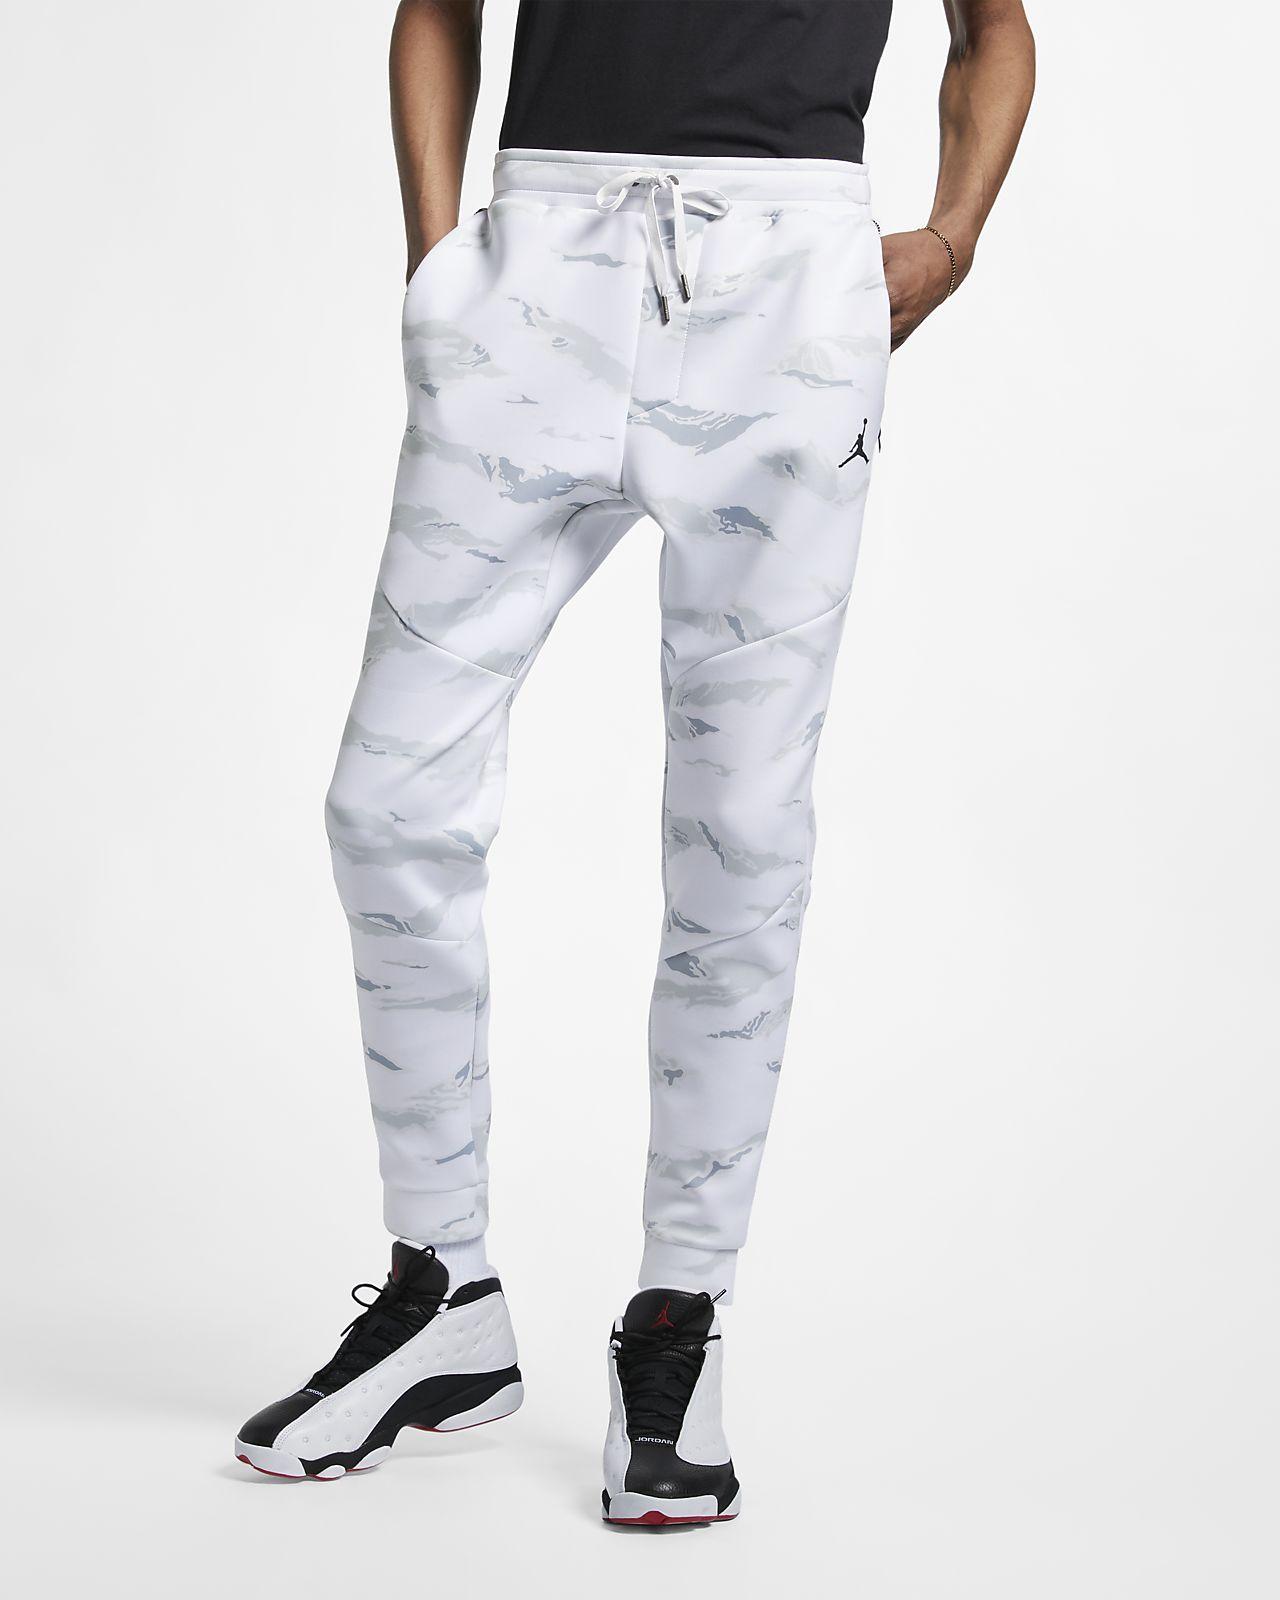 492a7f0794d310 Jordan Sportswear Flight Tech Men s Camo Trousers. Nike.com GB